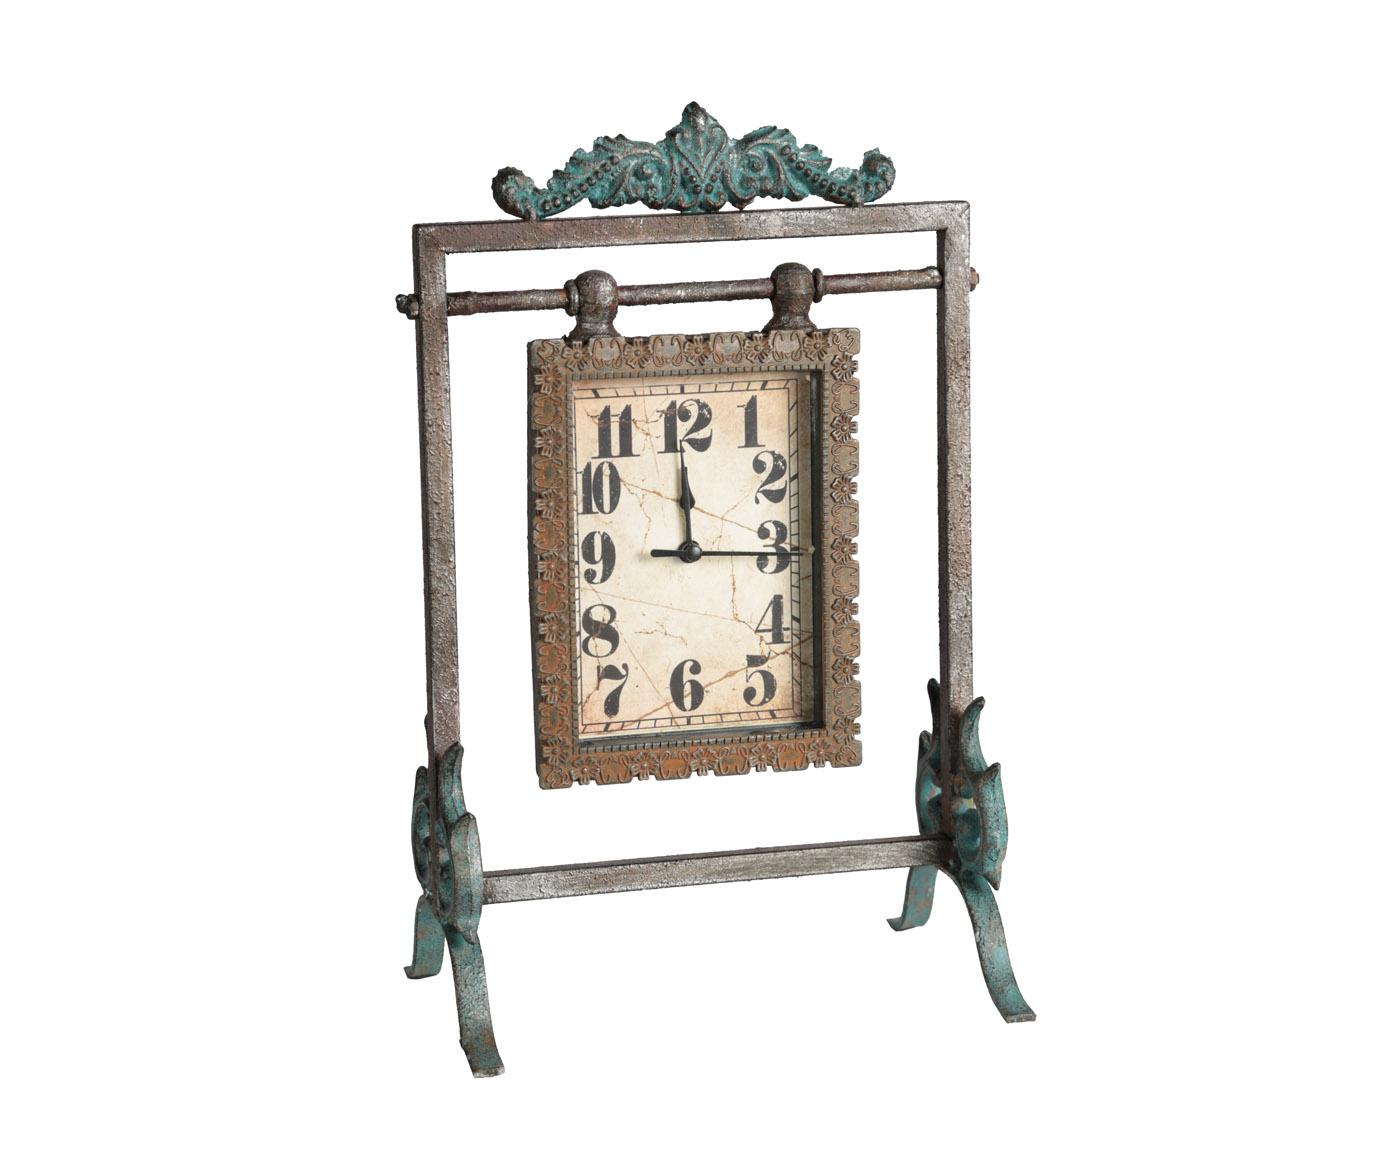 ЧасыНастольные часы<br>Кварцевый механизм, работают от батарейки типа АА.<br><br>Material: Металл<br>Width см: 21,5<br>Depth см: 13,5<br>Height см: 32,5